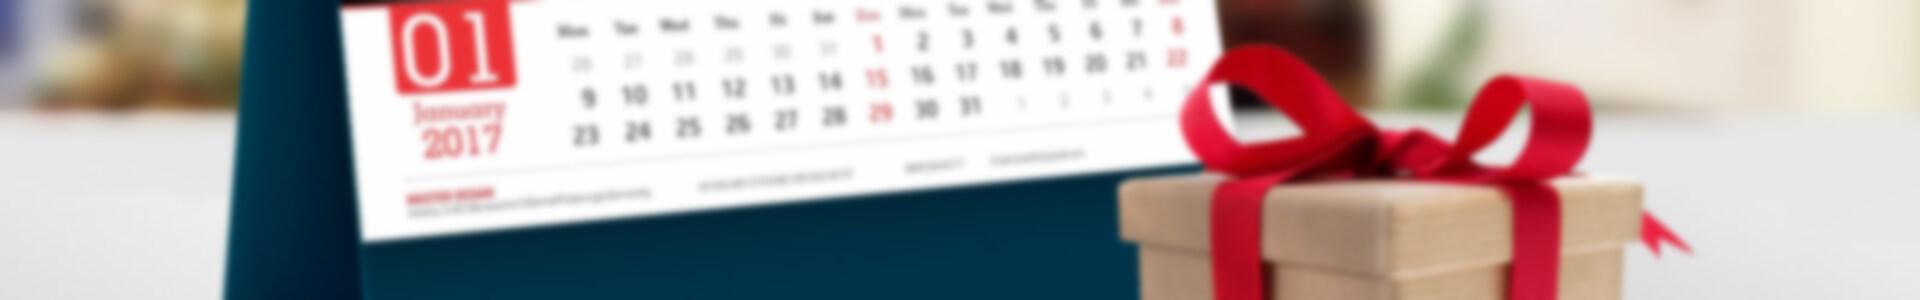 Free Desk Calendar Mockup PSD - In lịch tường, lịch bàn